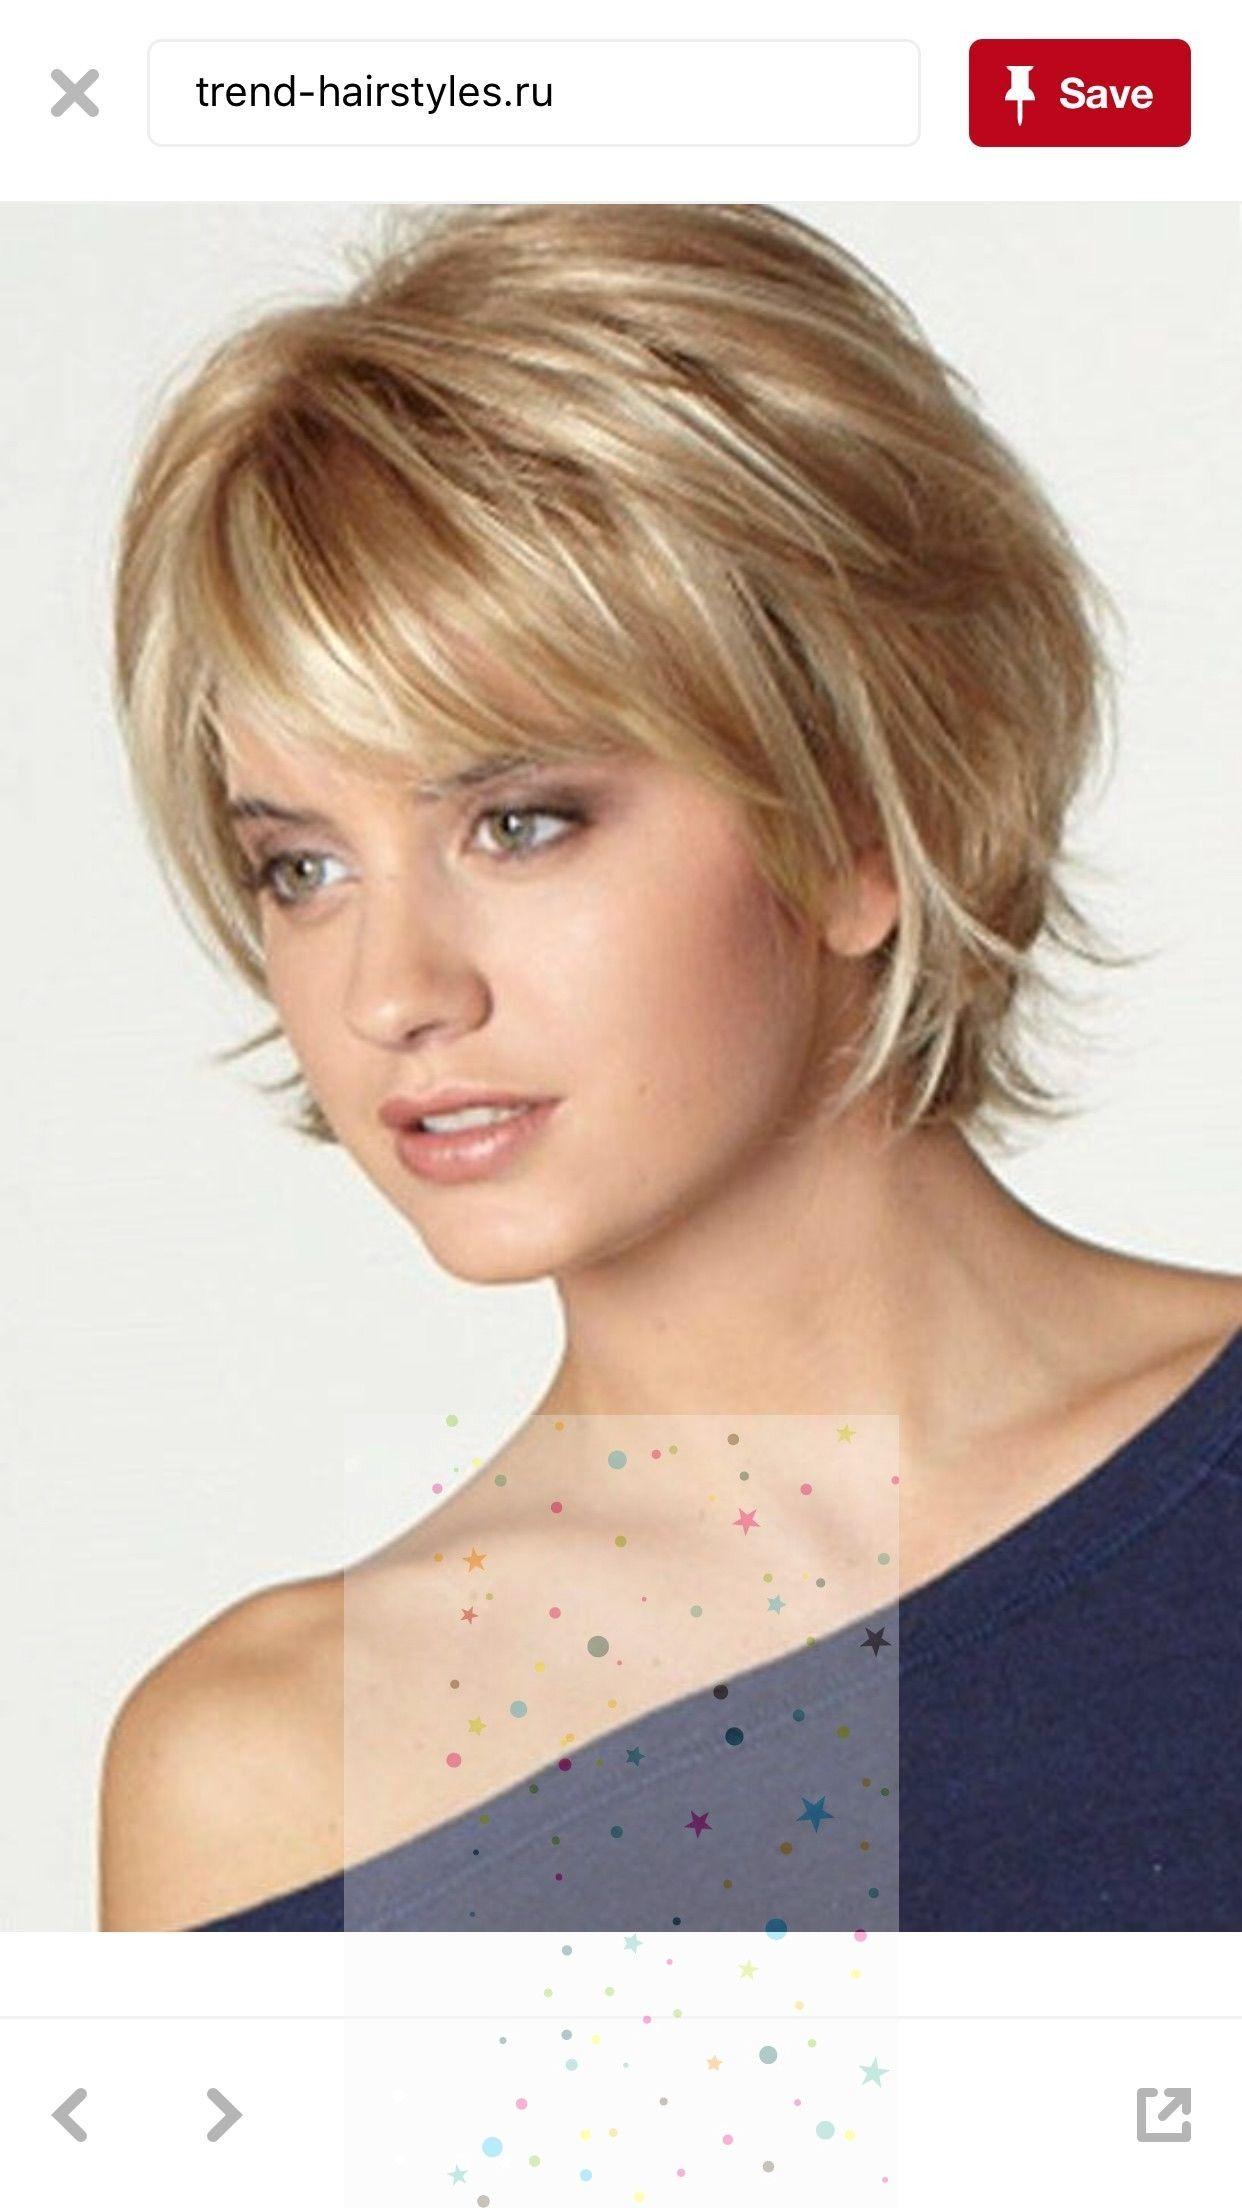 25 Gorgeous Medium Length Hairstyles For Women Over 50 Thick Hair Styles Medium Length Hair Styles Hair Styles For Women Over 50